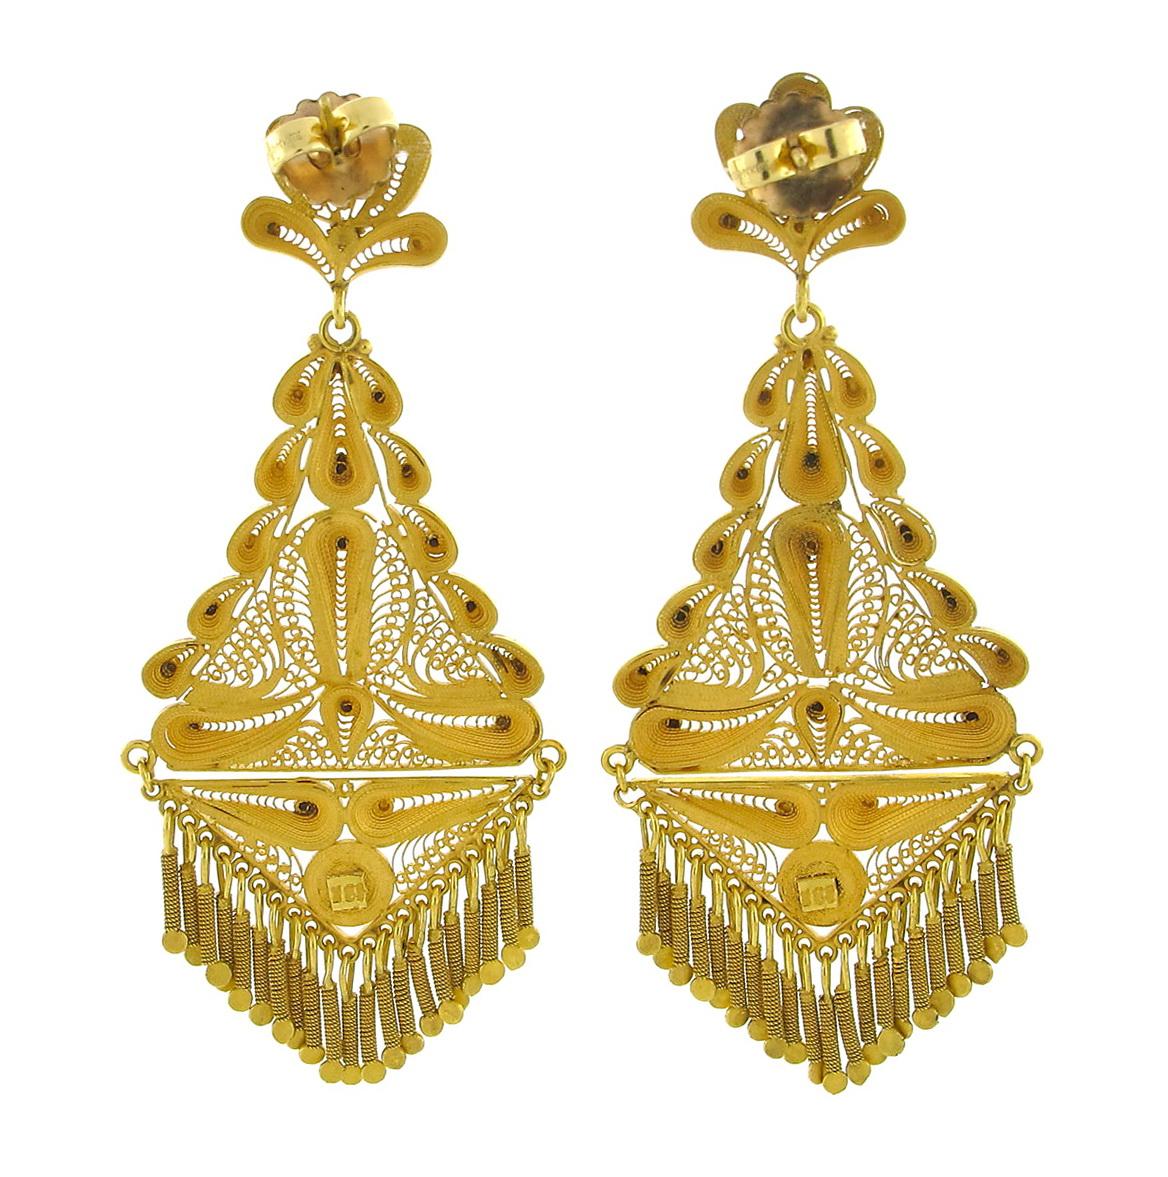 Indian diamond chandelier earrings home design ideas indian diamond chandelier earrings aloadofball Choice Image